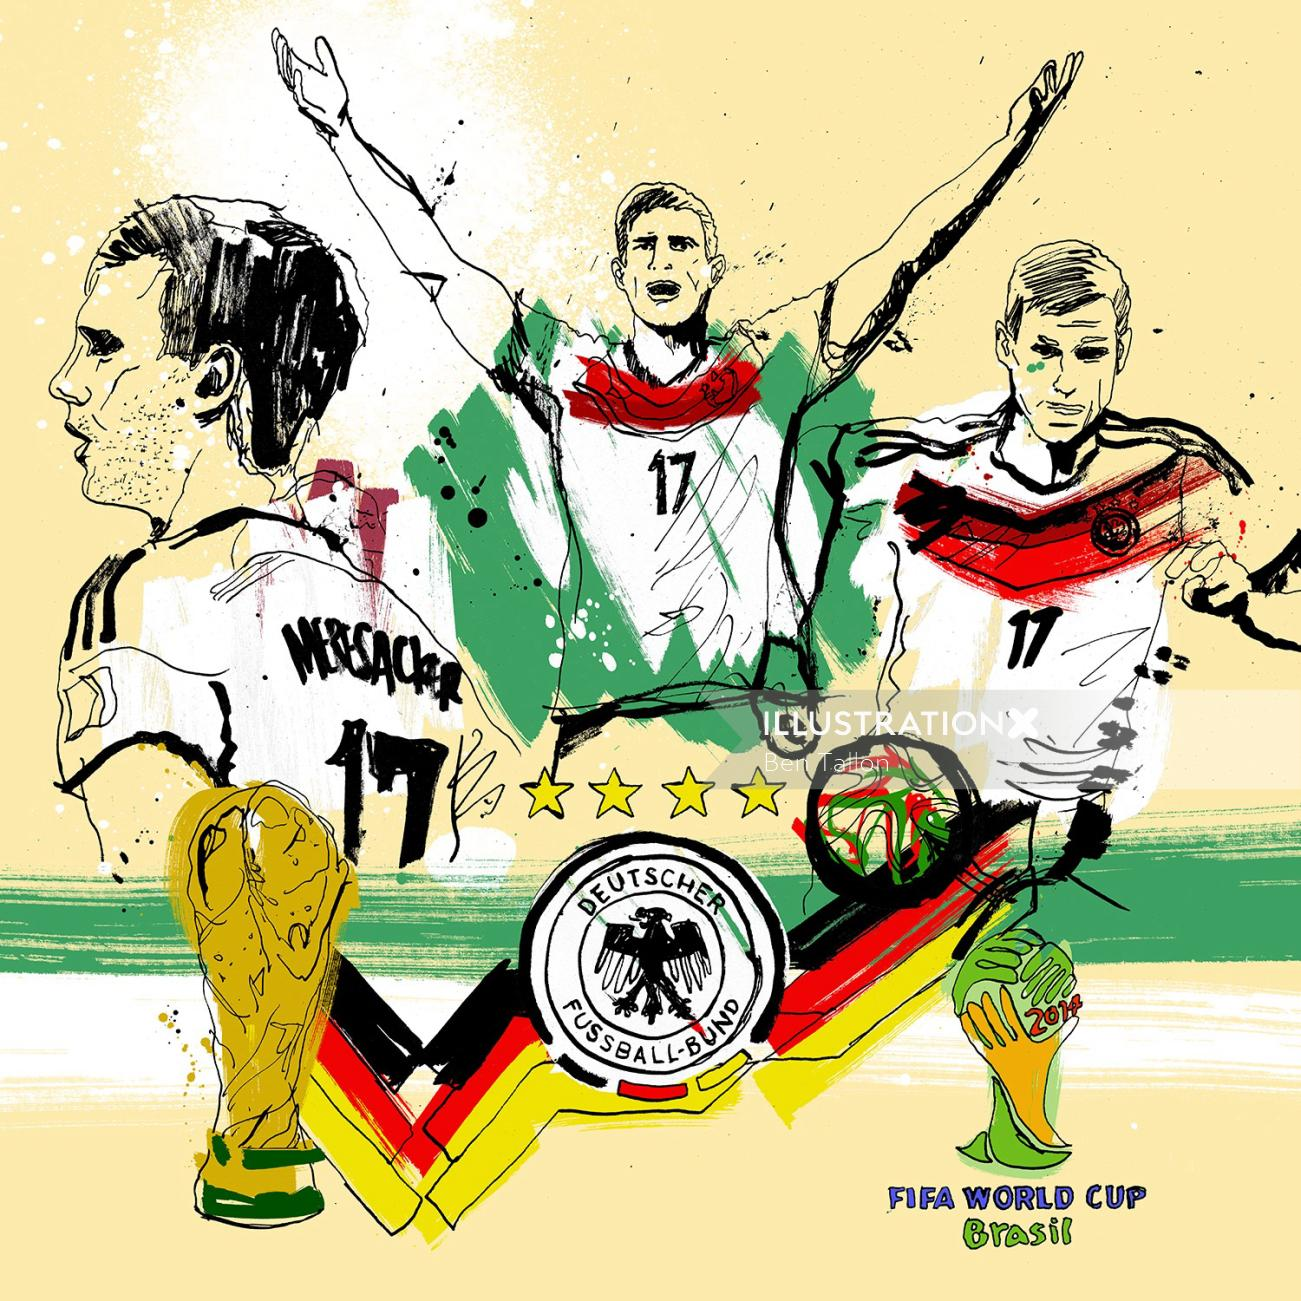 Animation artwork of Germany's world cup winning Per Mertesacker